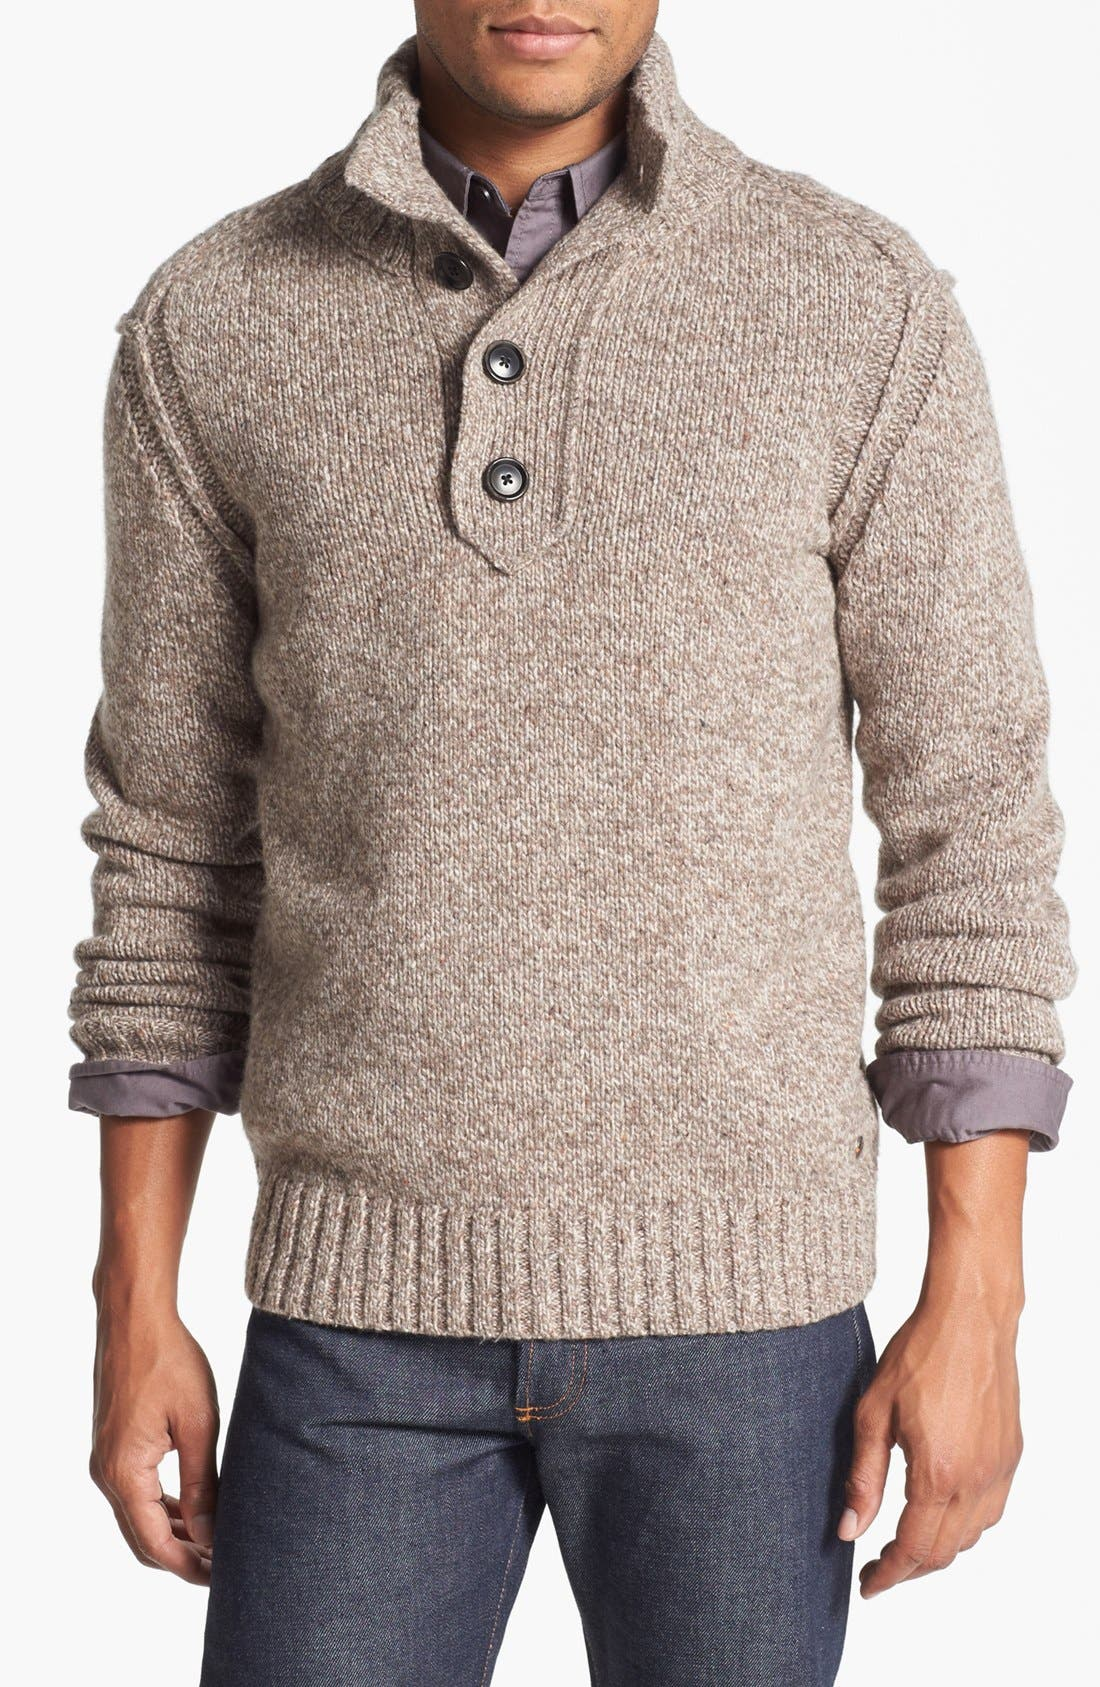 Alternate Image 1 Selected - BOSS Orange 'Ajeno' Quarter Zip Tweed Yarn Sweater